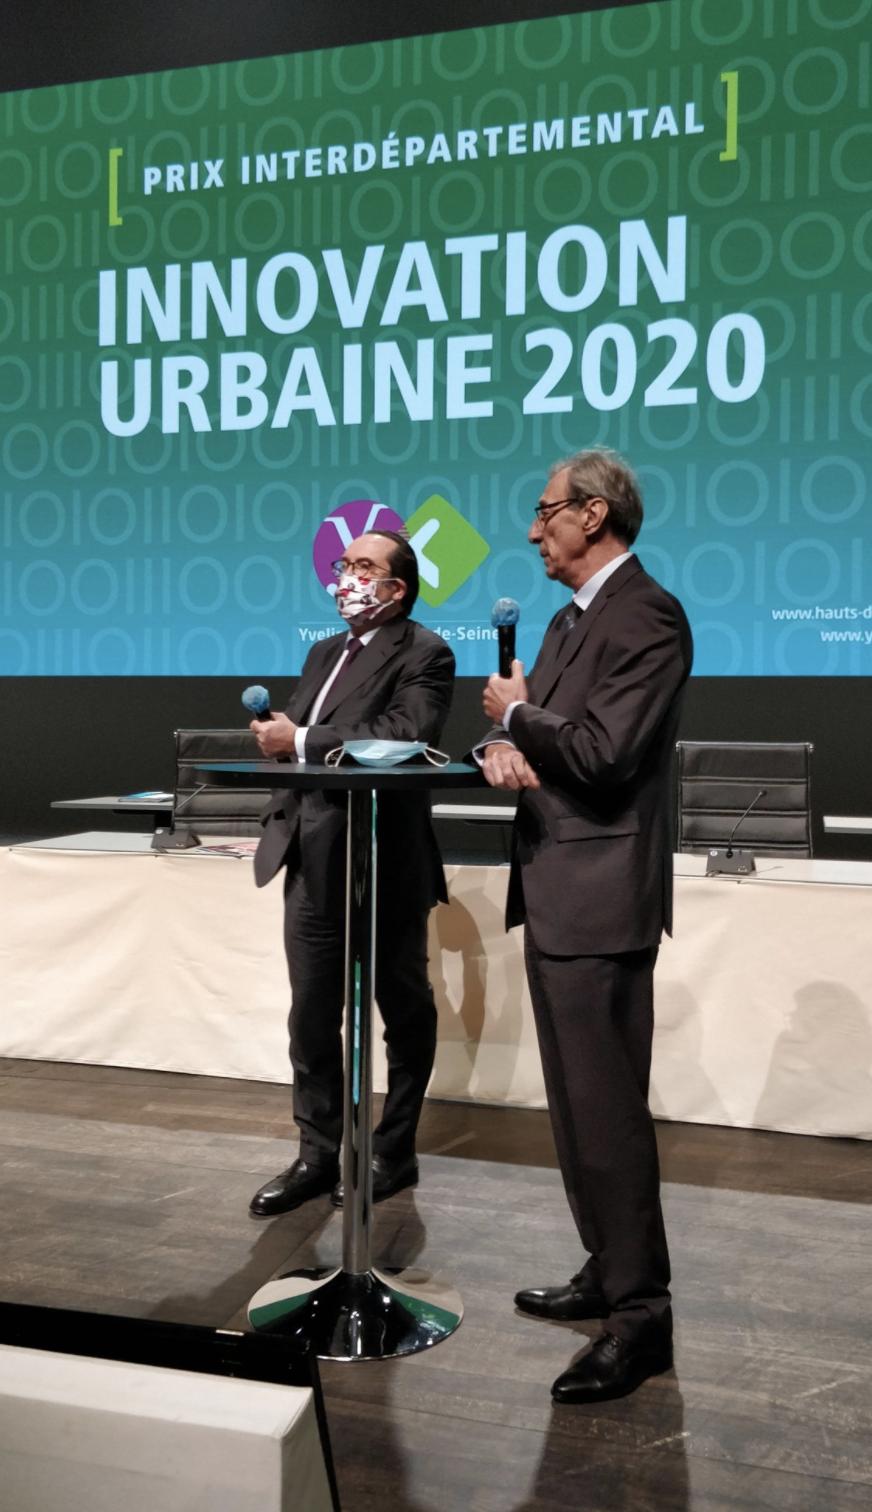 Prix interdépartemental de l'innovation urbaine 2020 © Twitter CD92